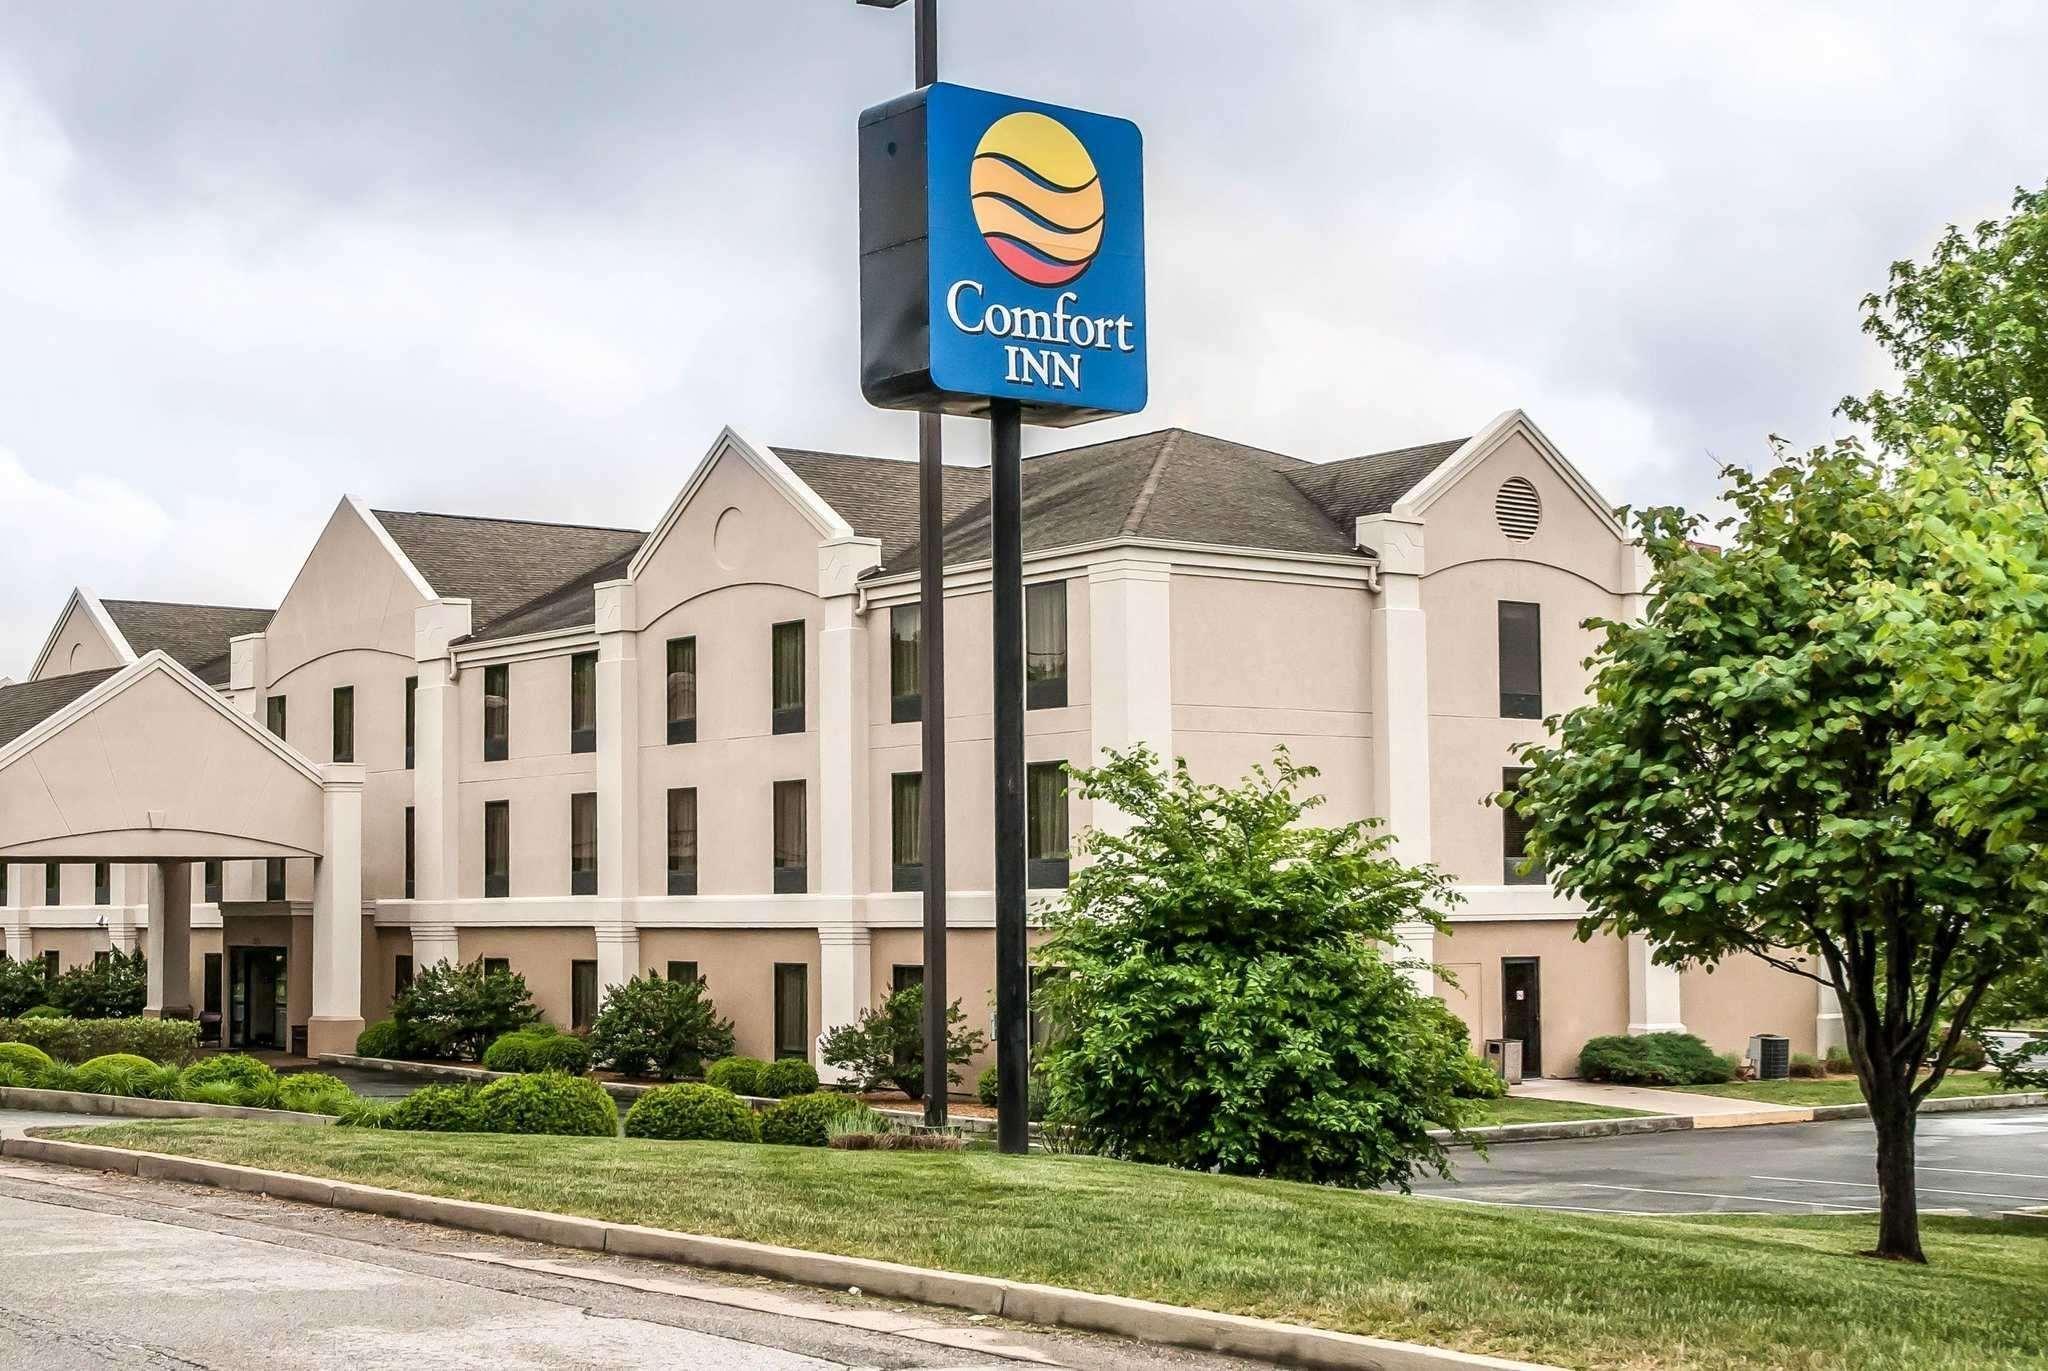 Comfort Inn Near Six Flags St. Louis